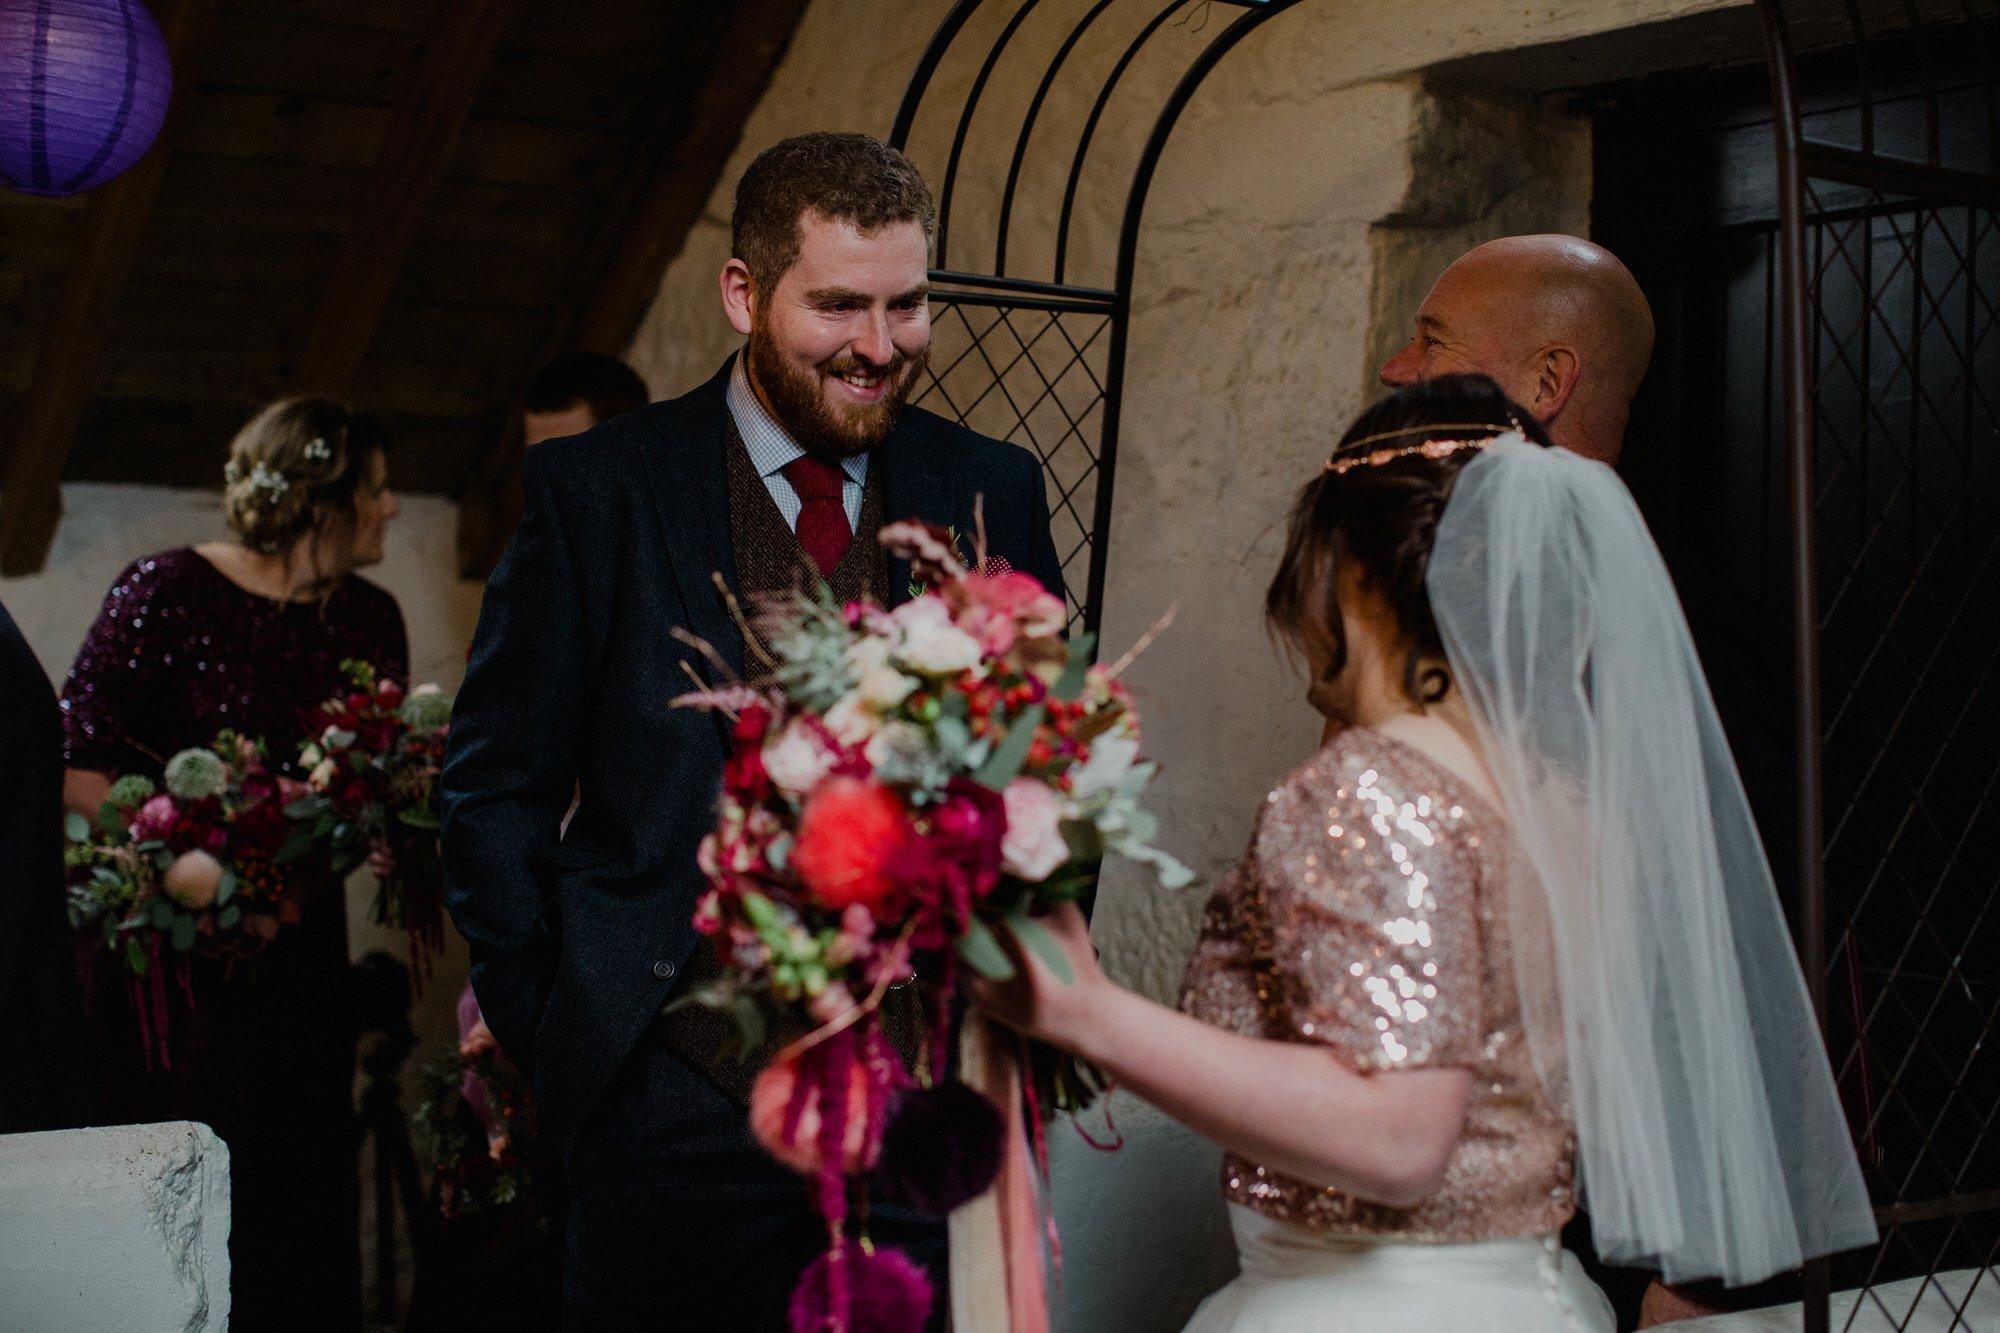 022 TIN SHED KNOCKRAICH FARM WEDDING ALTERNATIVE BRIDE ZOE ALEXANDRA PHOTOGRAPHY